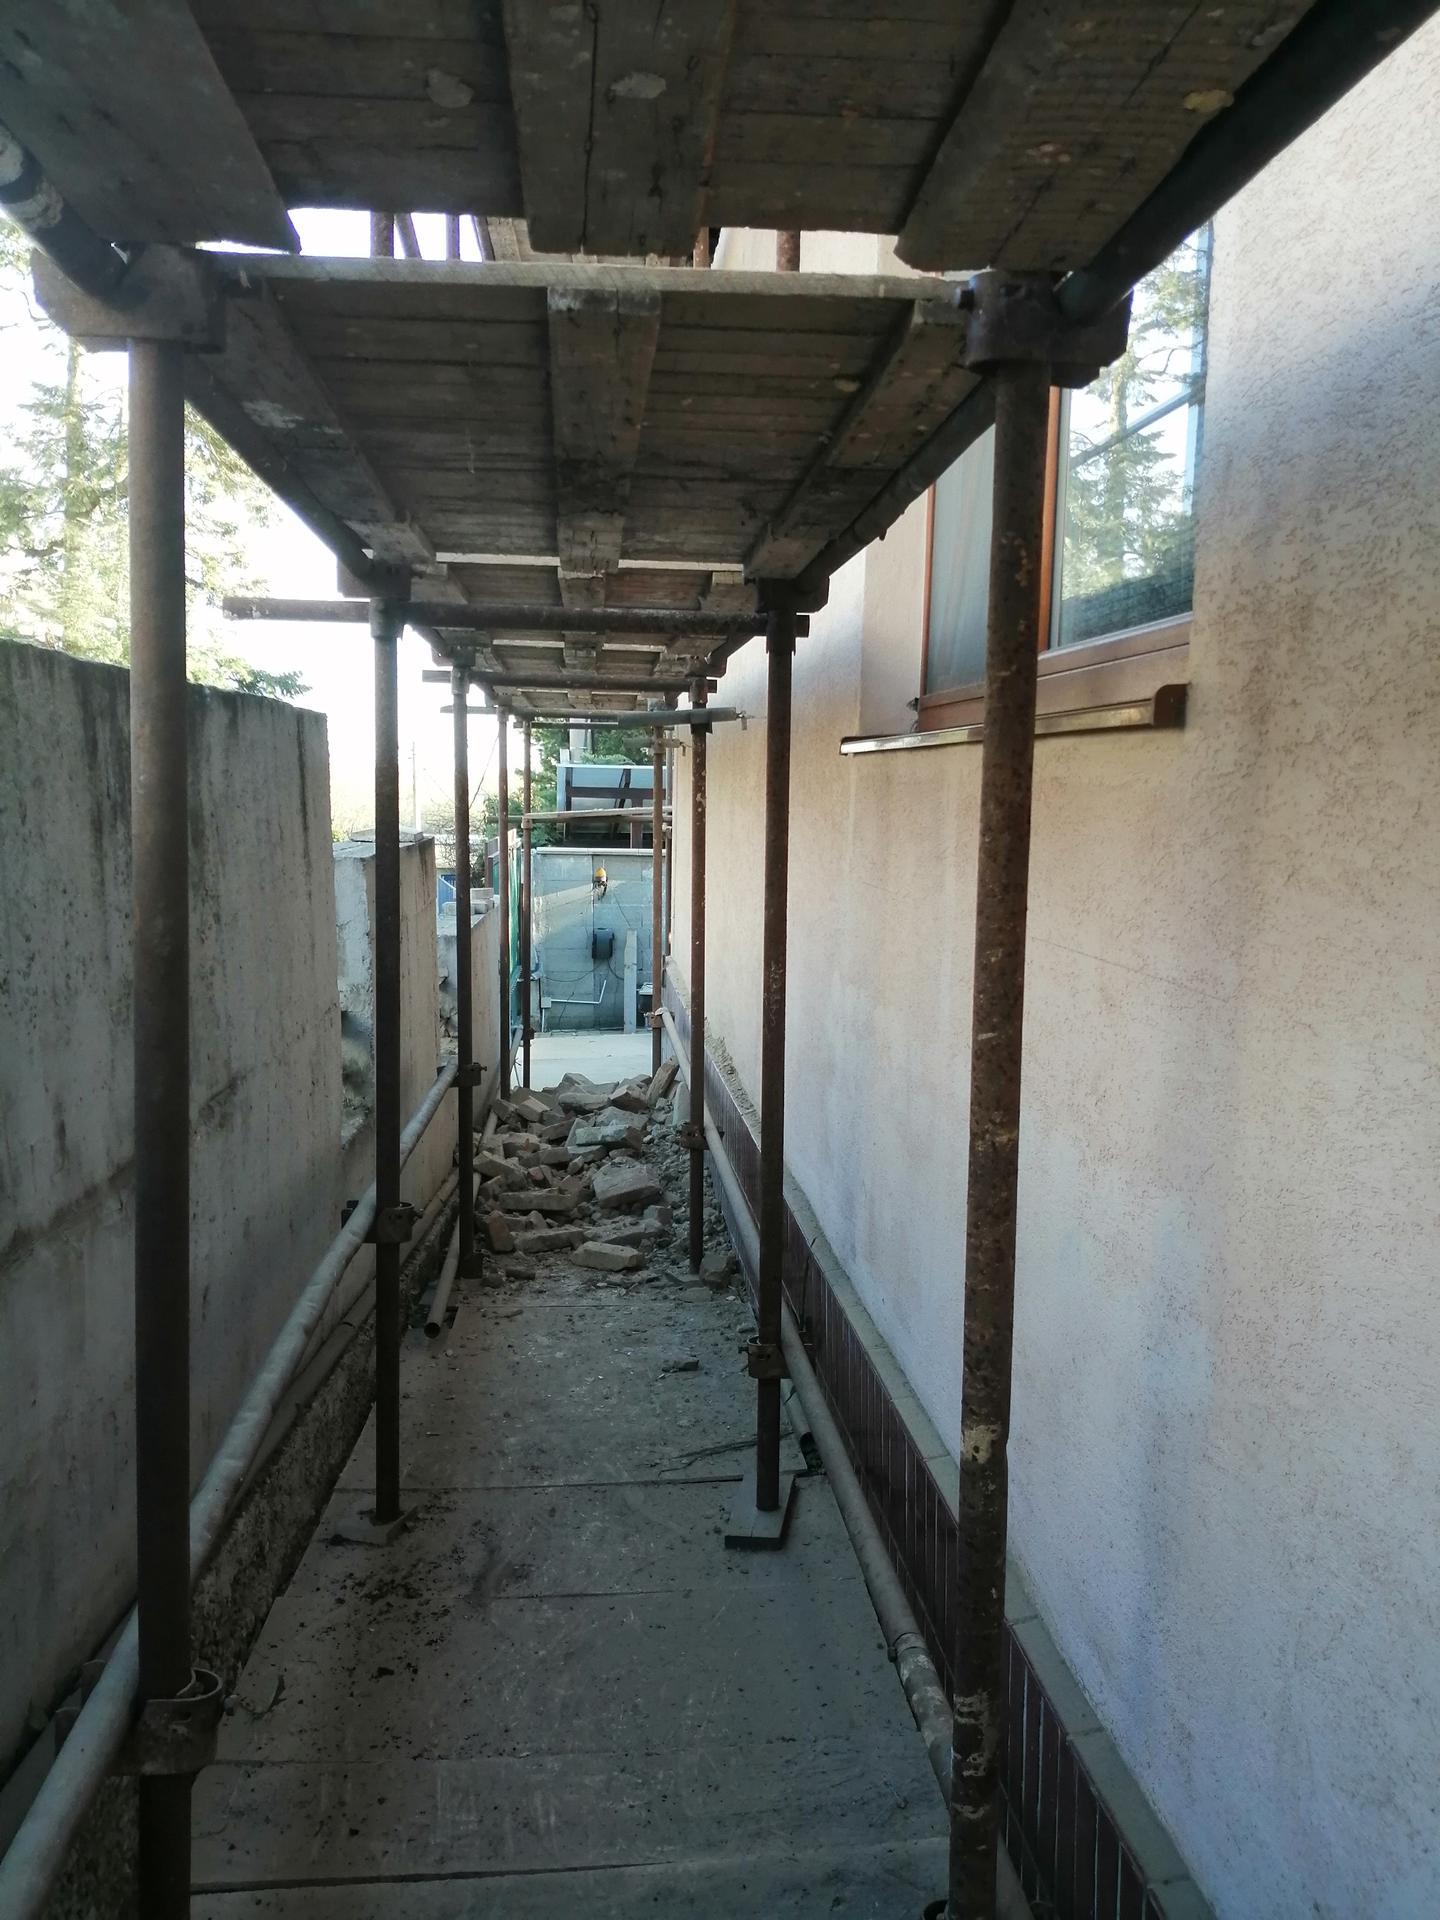 Prestavba podkrovia zo sedlovo valbovej na sedlovú strechu. - Obrázok č. 37